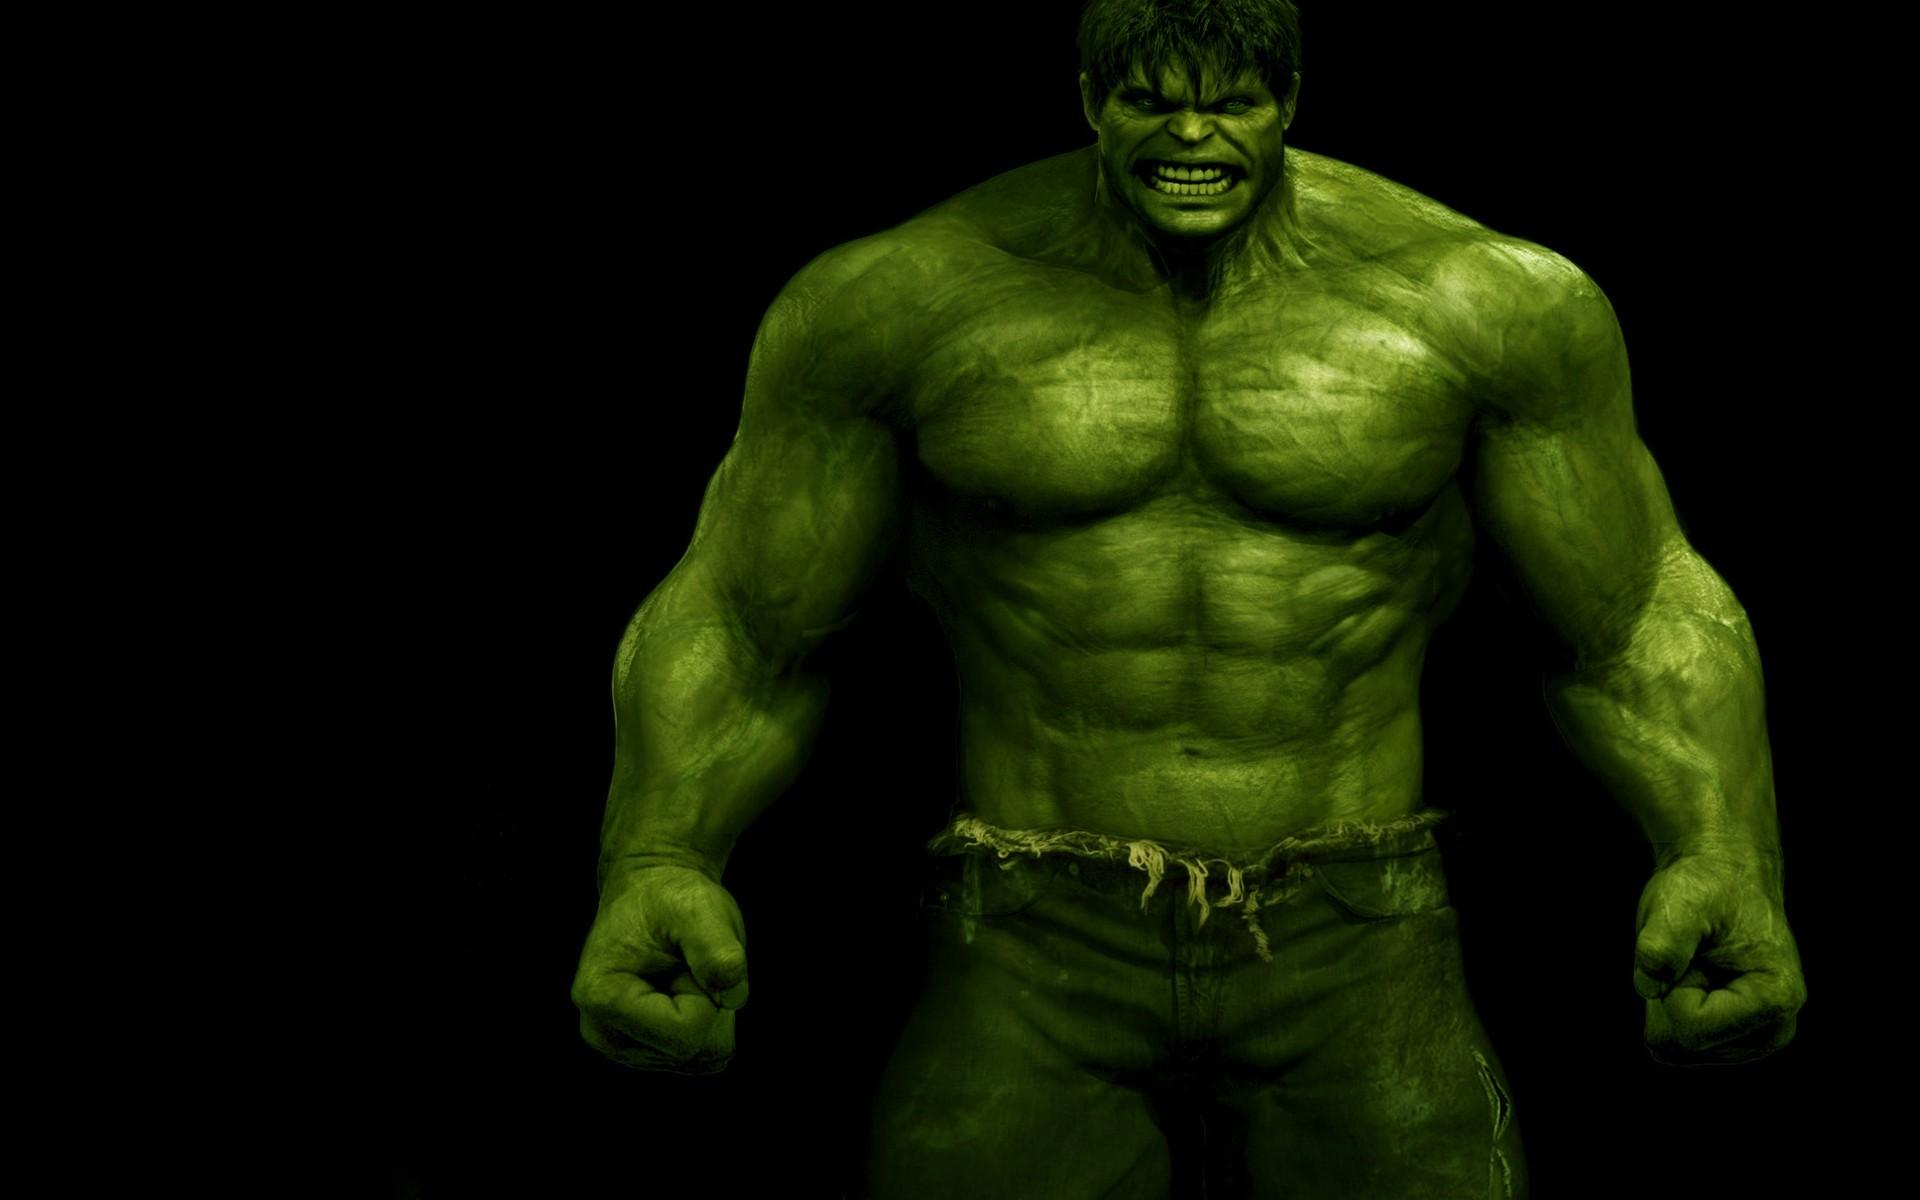 1920x1200 The Incredible Hulk HD Wallpaper 6277